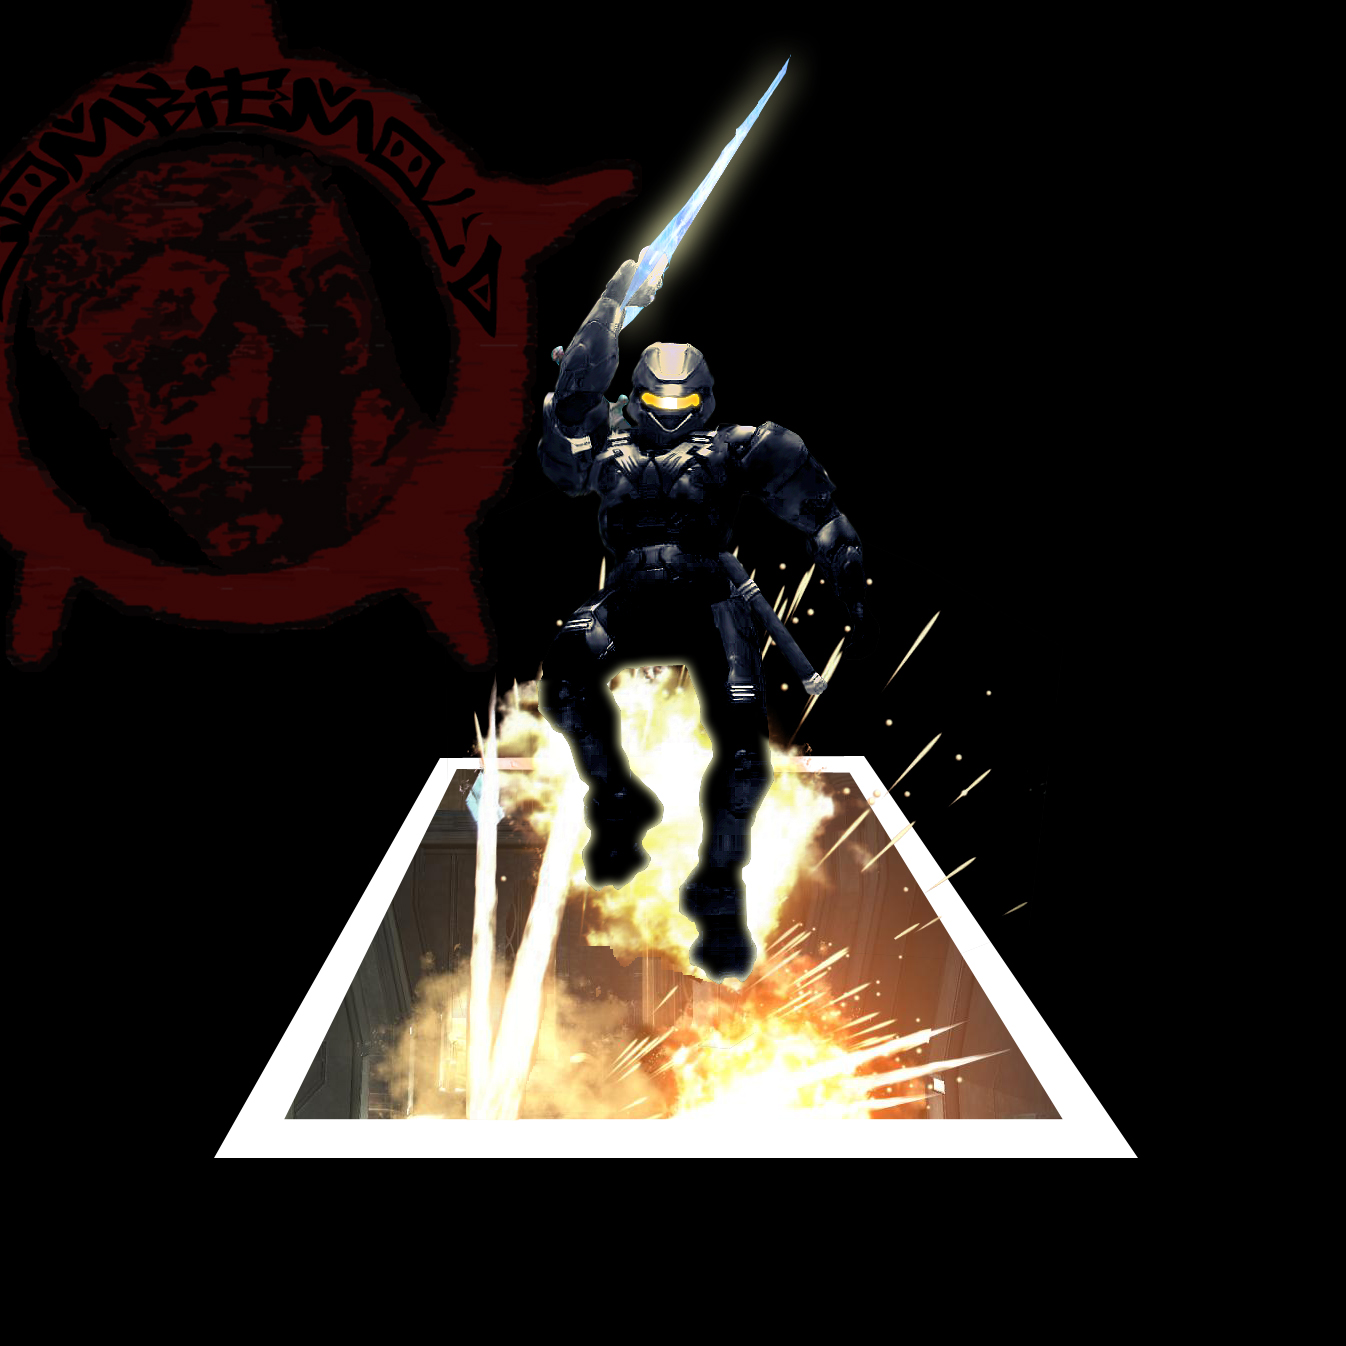 Halo Live Wallpaper: Halo 3 Spartan Zombie By Zombiemold On DeviantArt